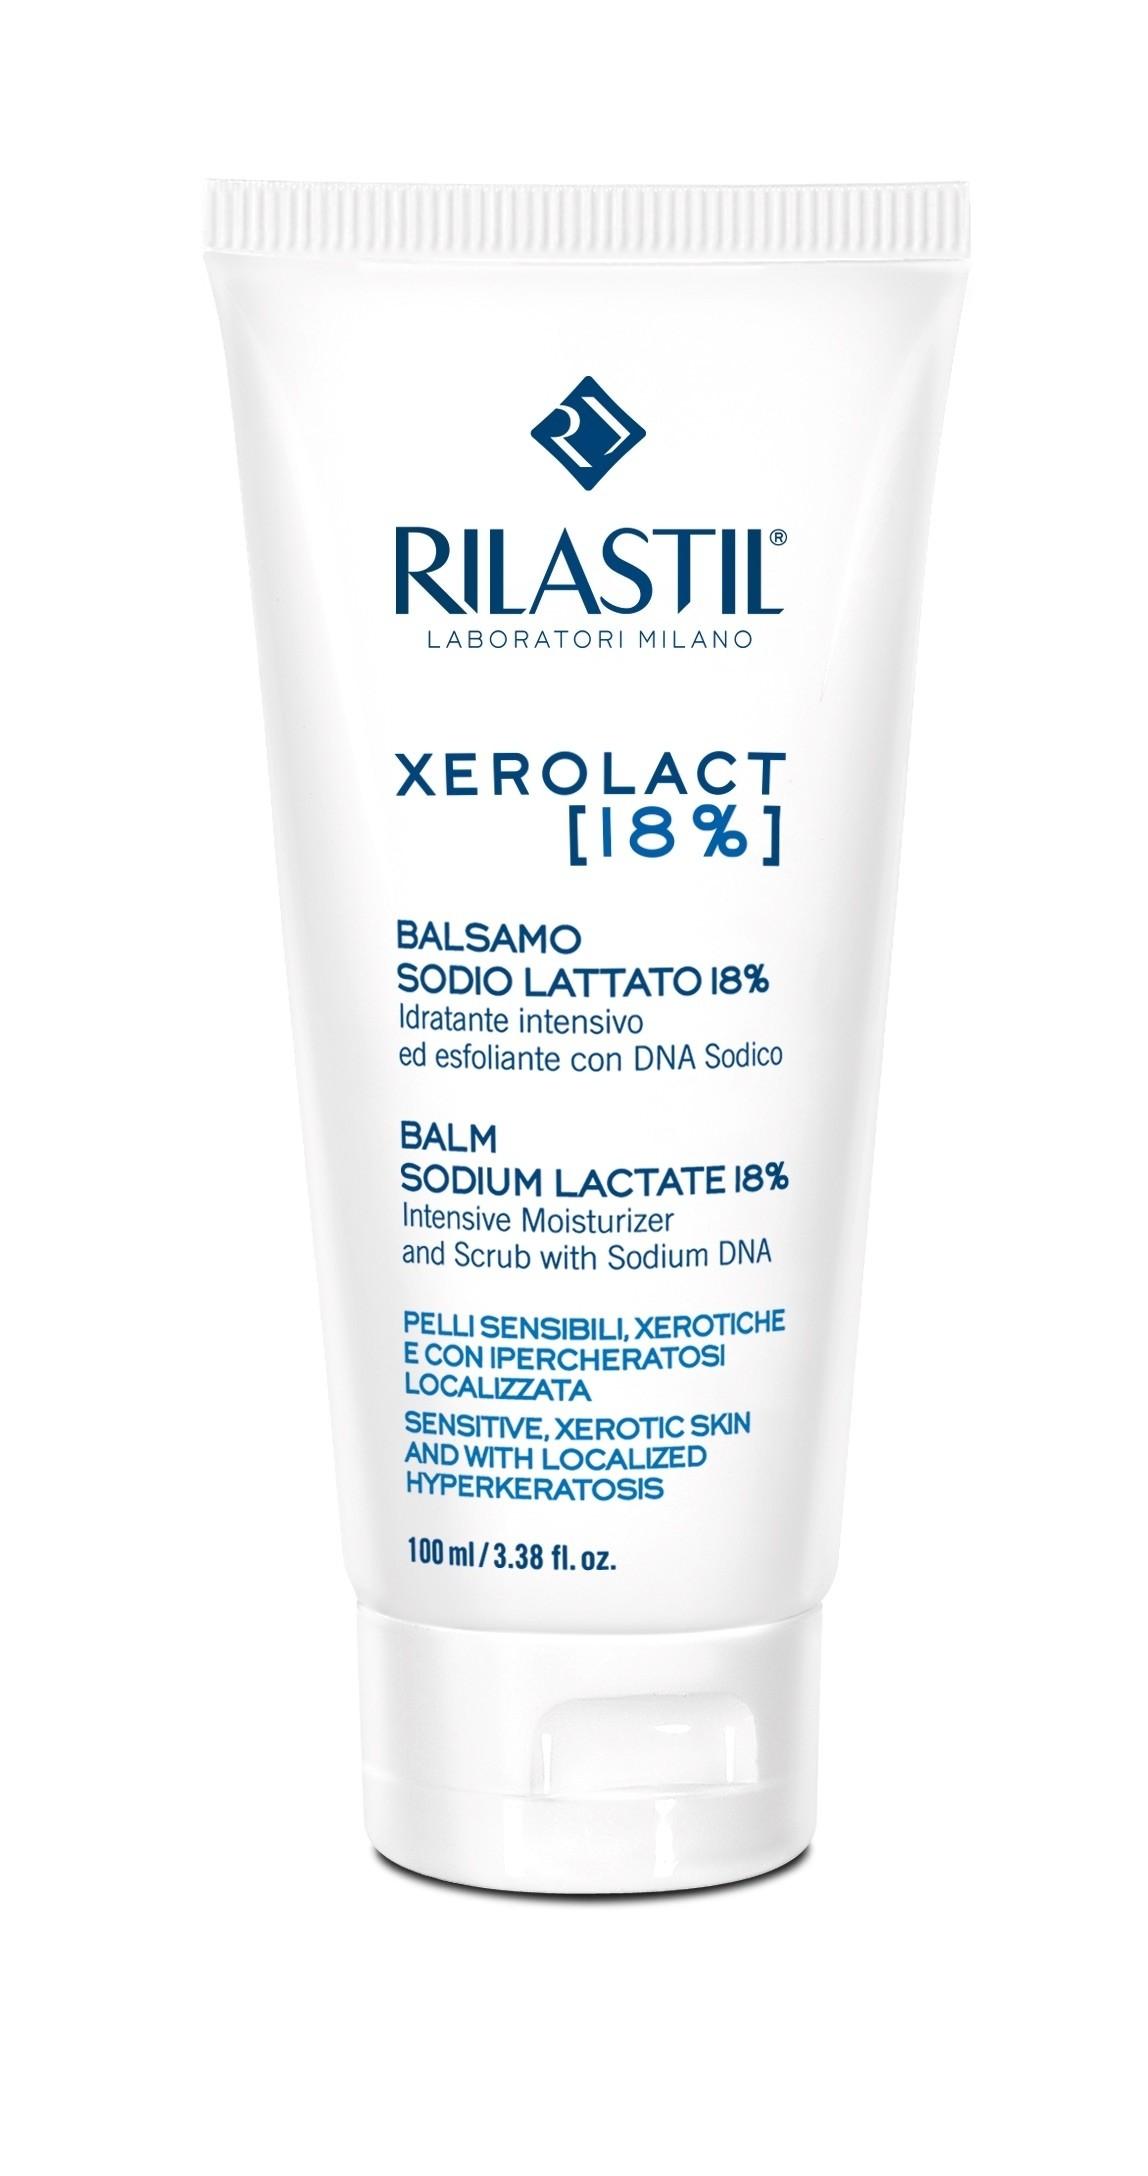 Rilastil Xerolact[E] Balsamo Sodio Lattato 18% 100ml